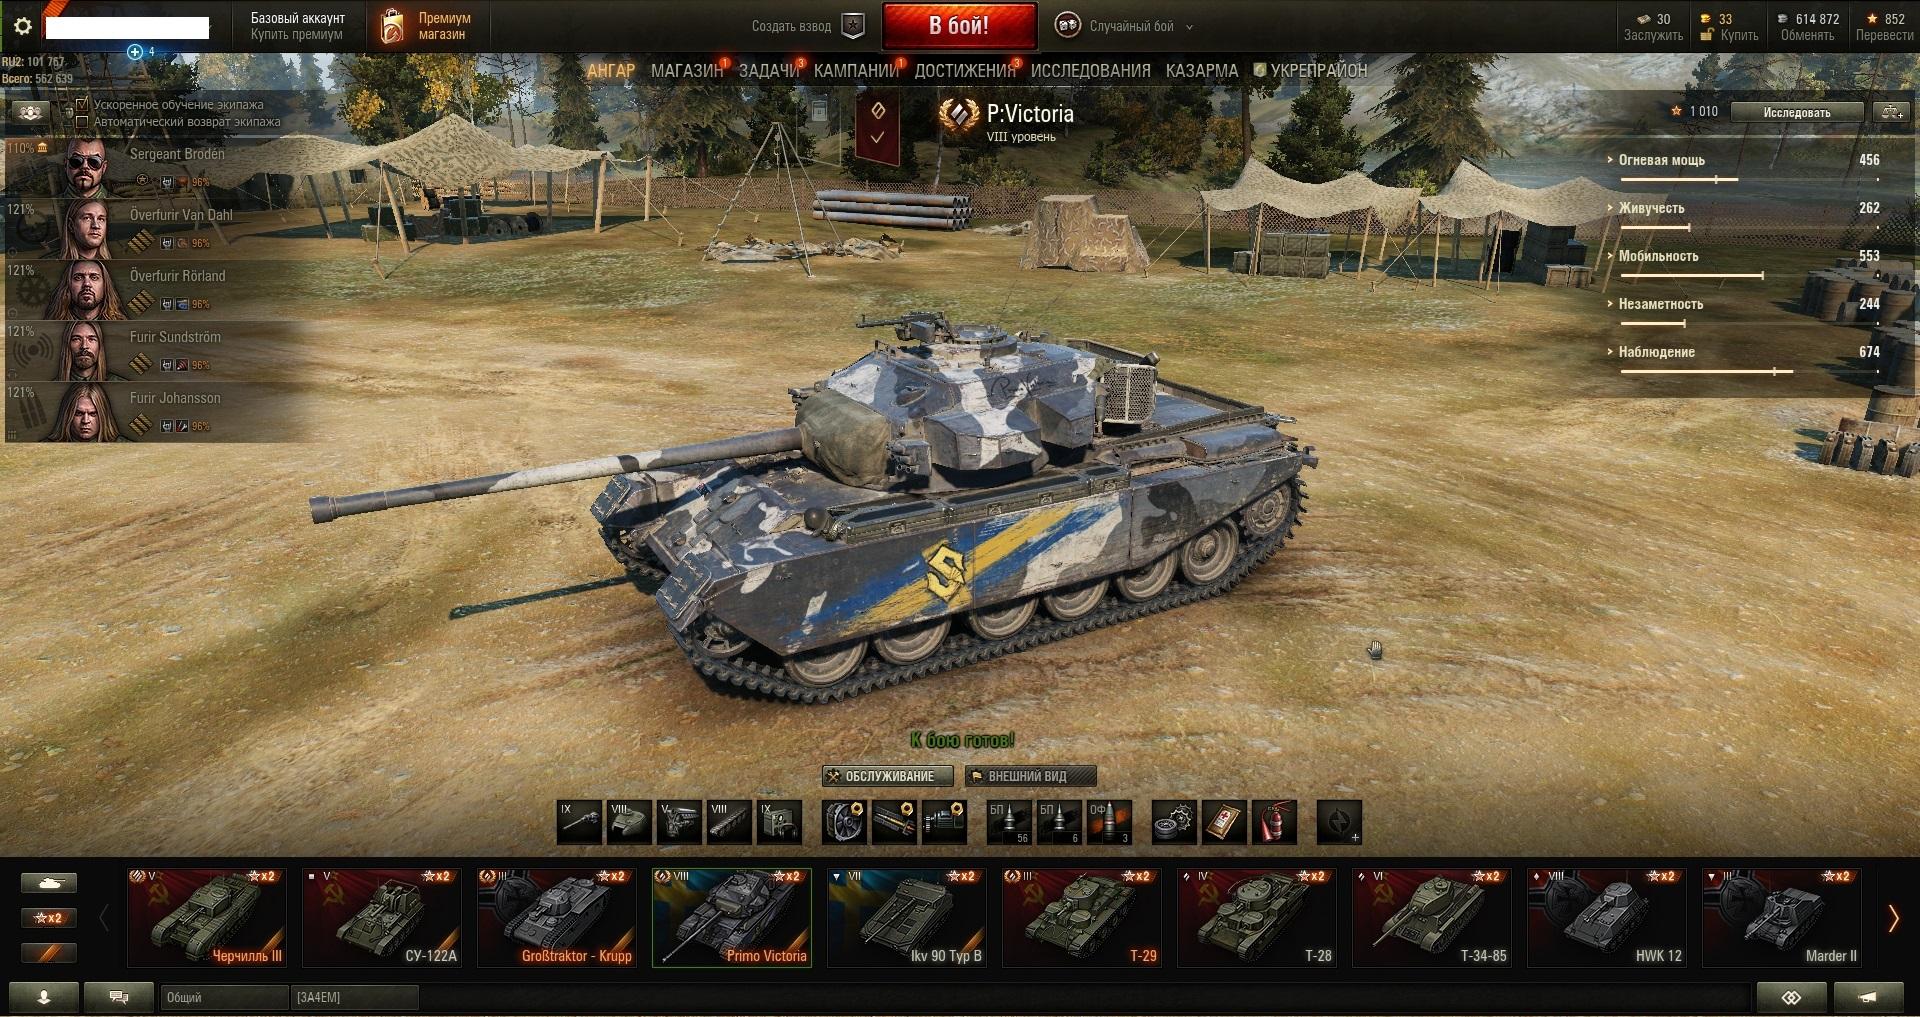 WoT World of Tanks Аккаунт с эксклюзивами №1